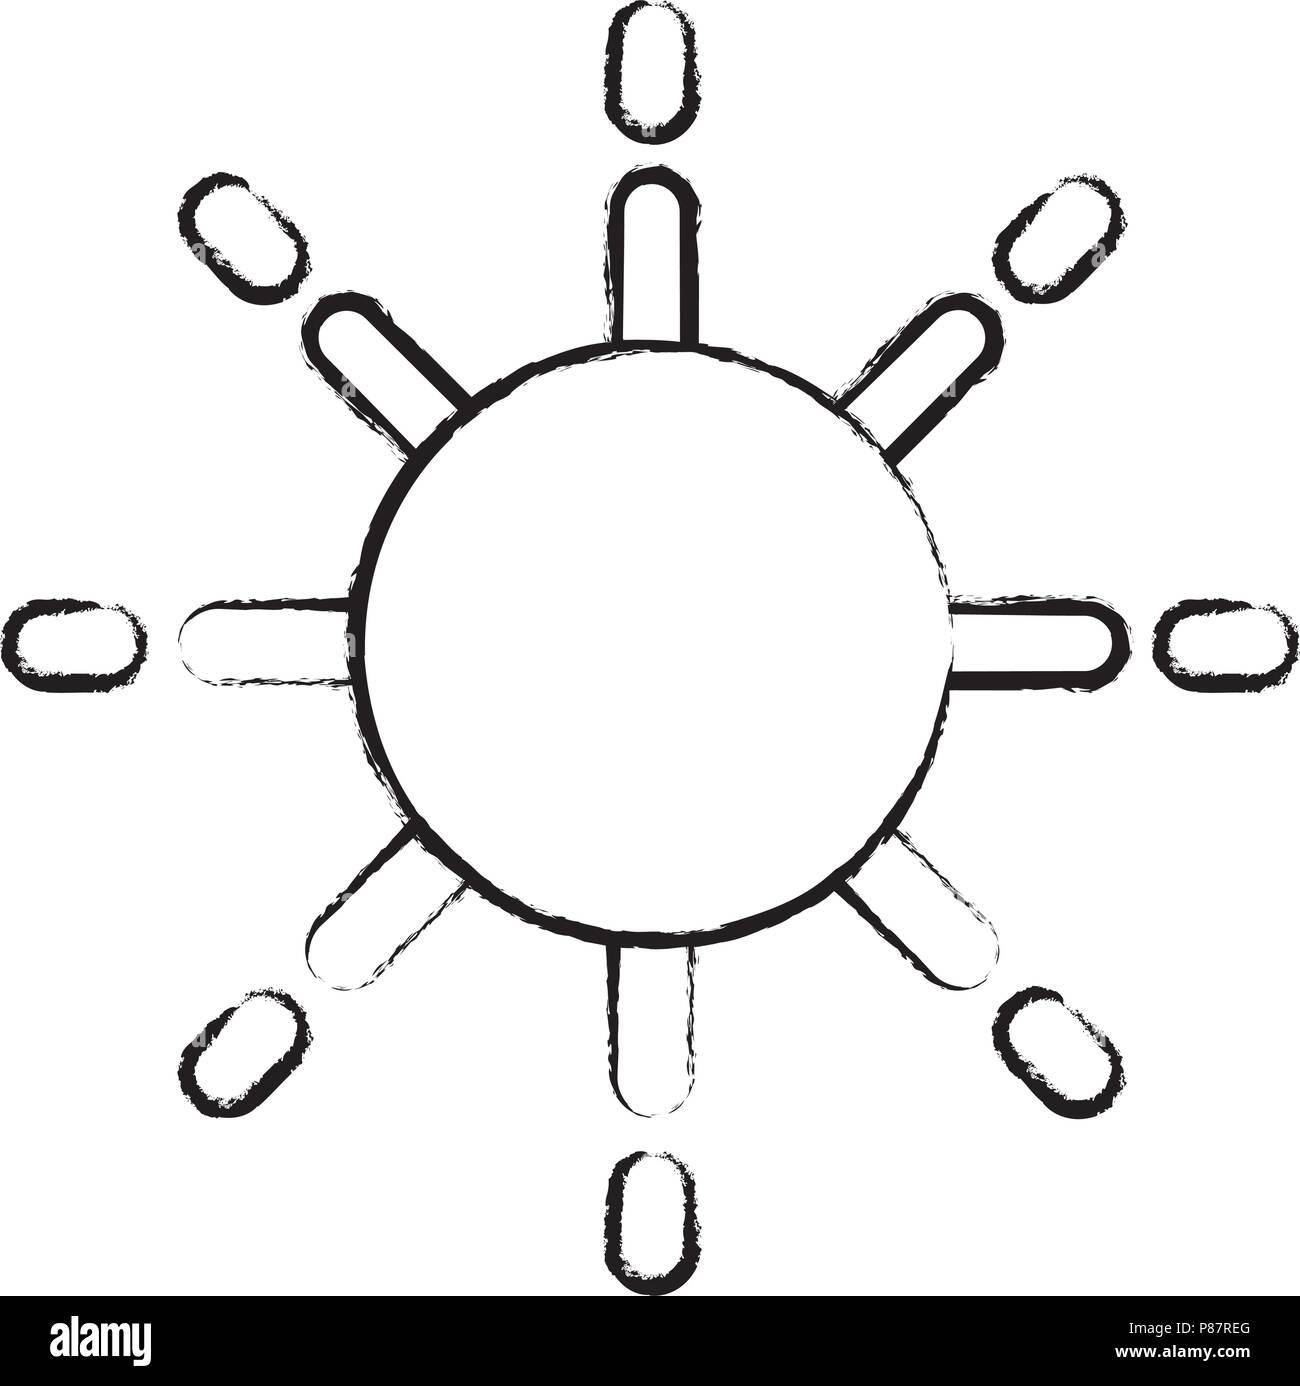 sun icon over white background, vector illustration - Stock Image